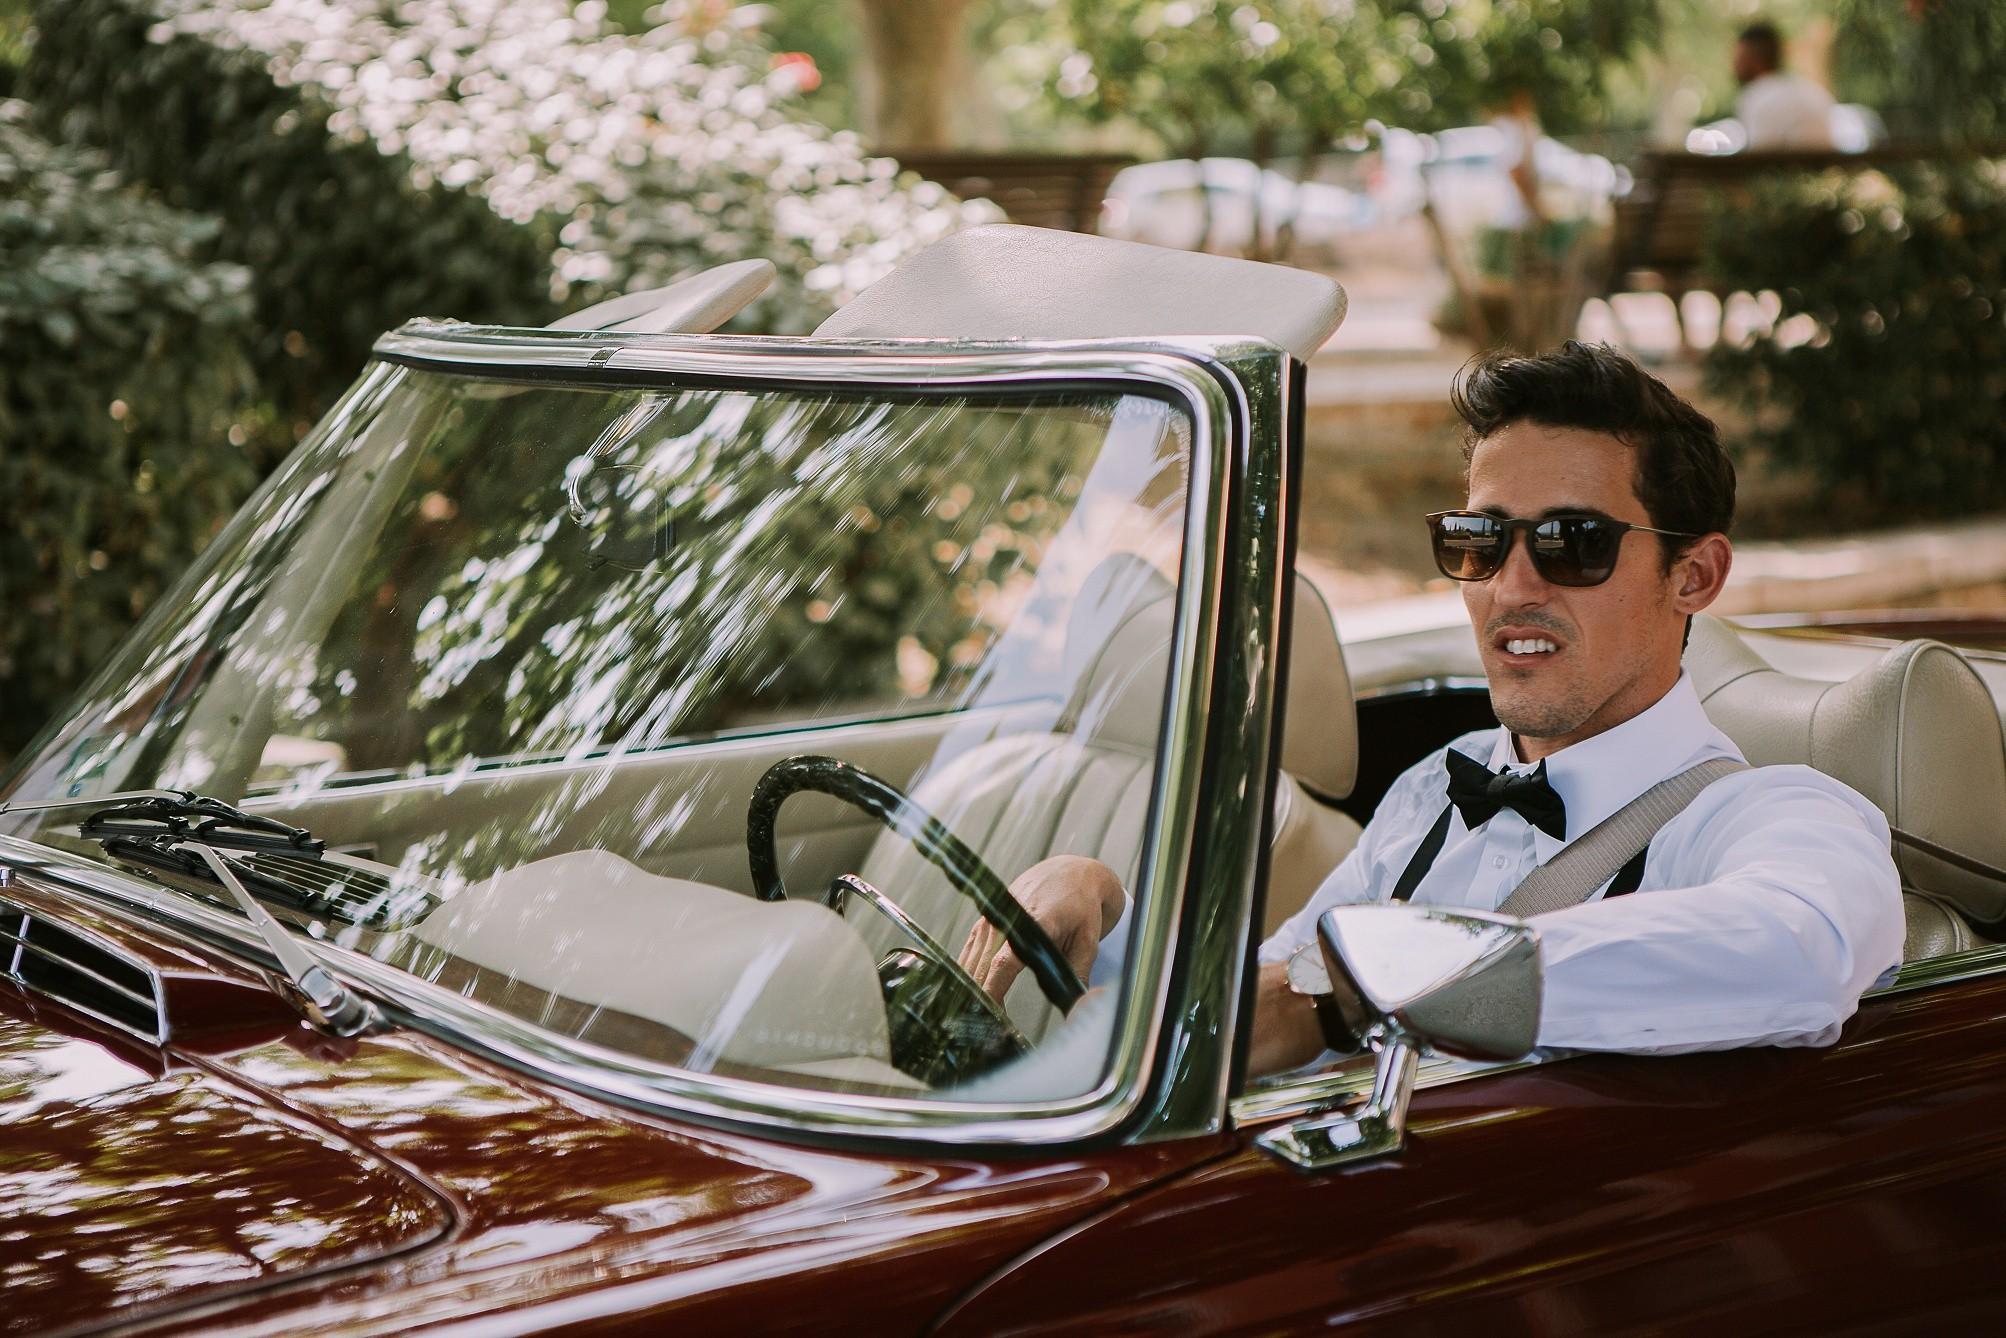 katerynaphotos-mariage-photographe-puyloubier-provence-aix-en-provence-sud-de-la-france_0386.jpg